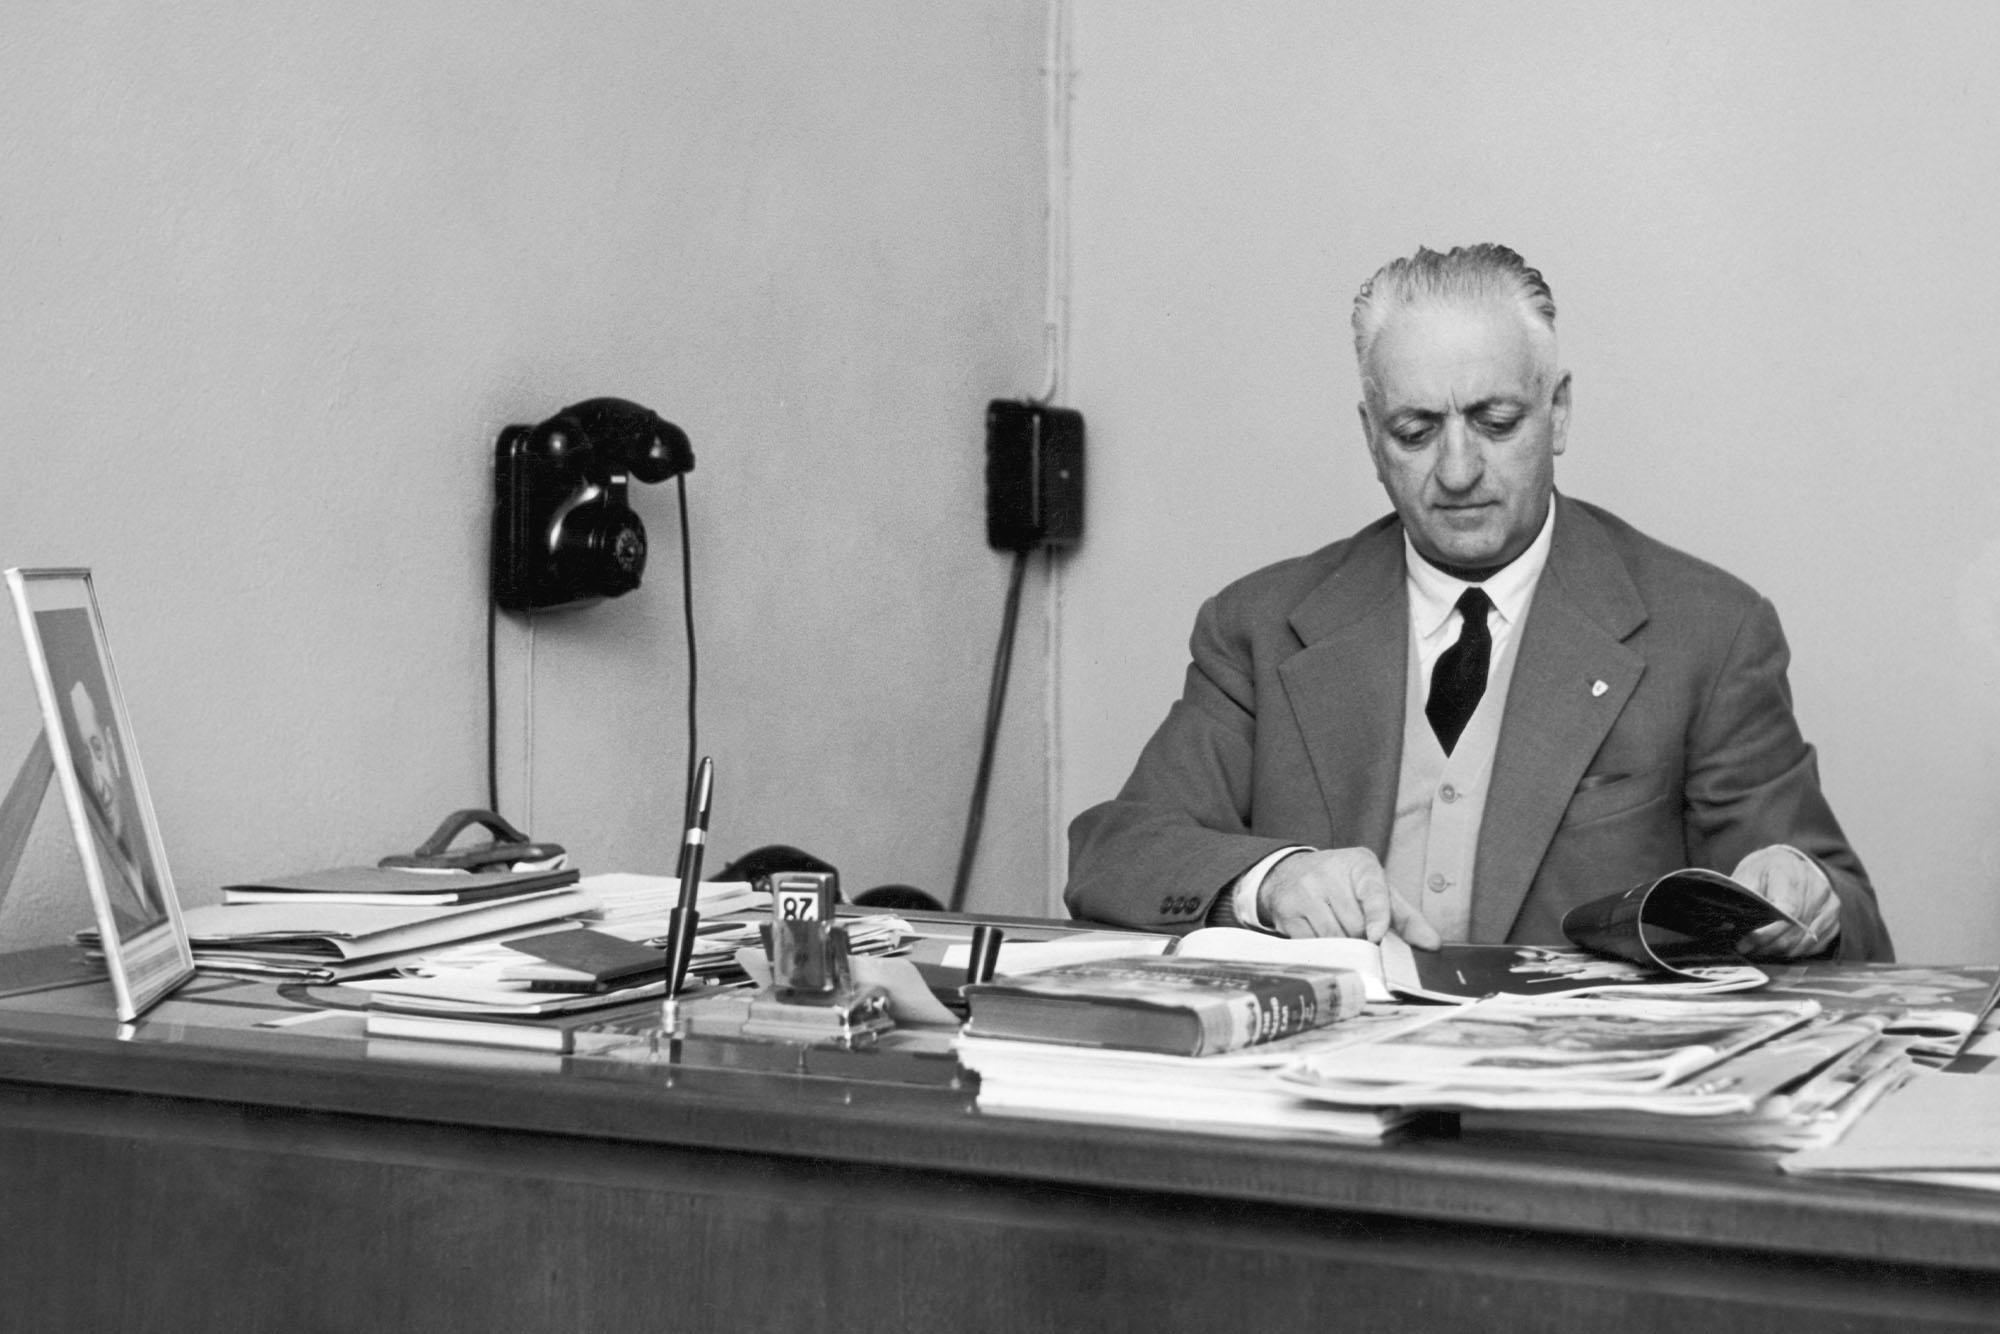 Italian car manufacturer Enzo Ferrari (1898 - 1988) at his desk, circa 1955. (Photo by Keystone/Hulton Archive/Getty Images)